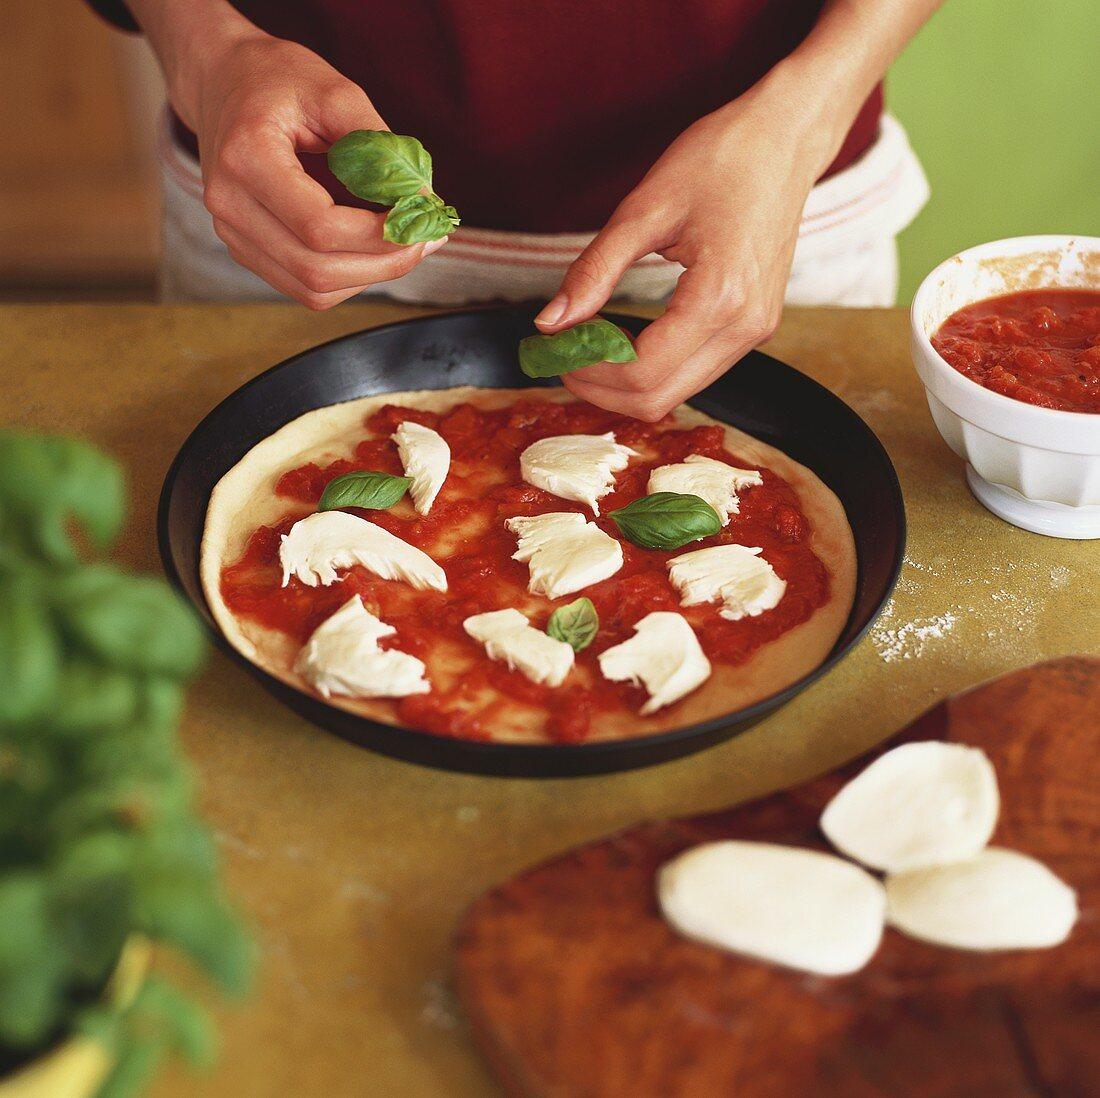 Making Pizza Margherita (adding basil)